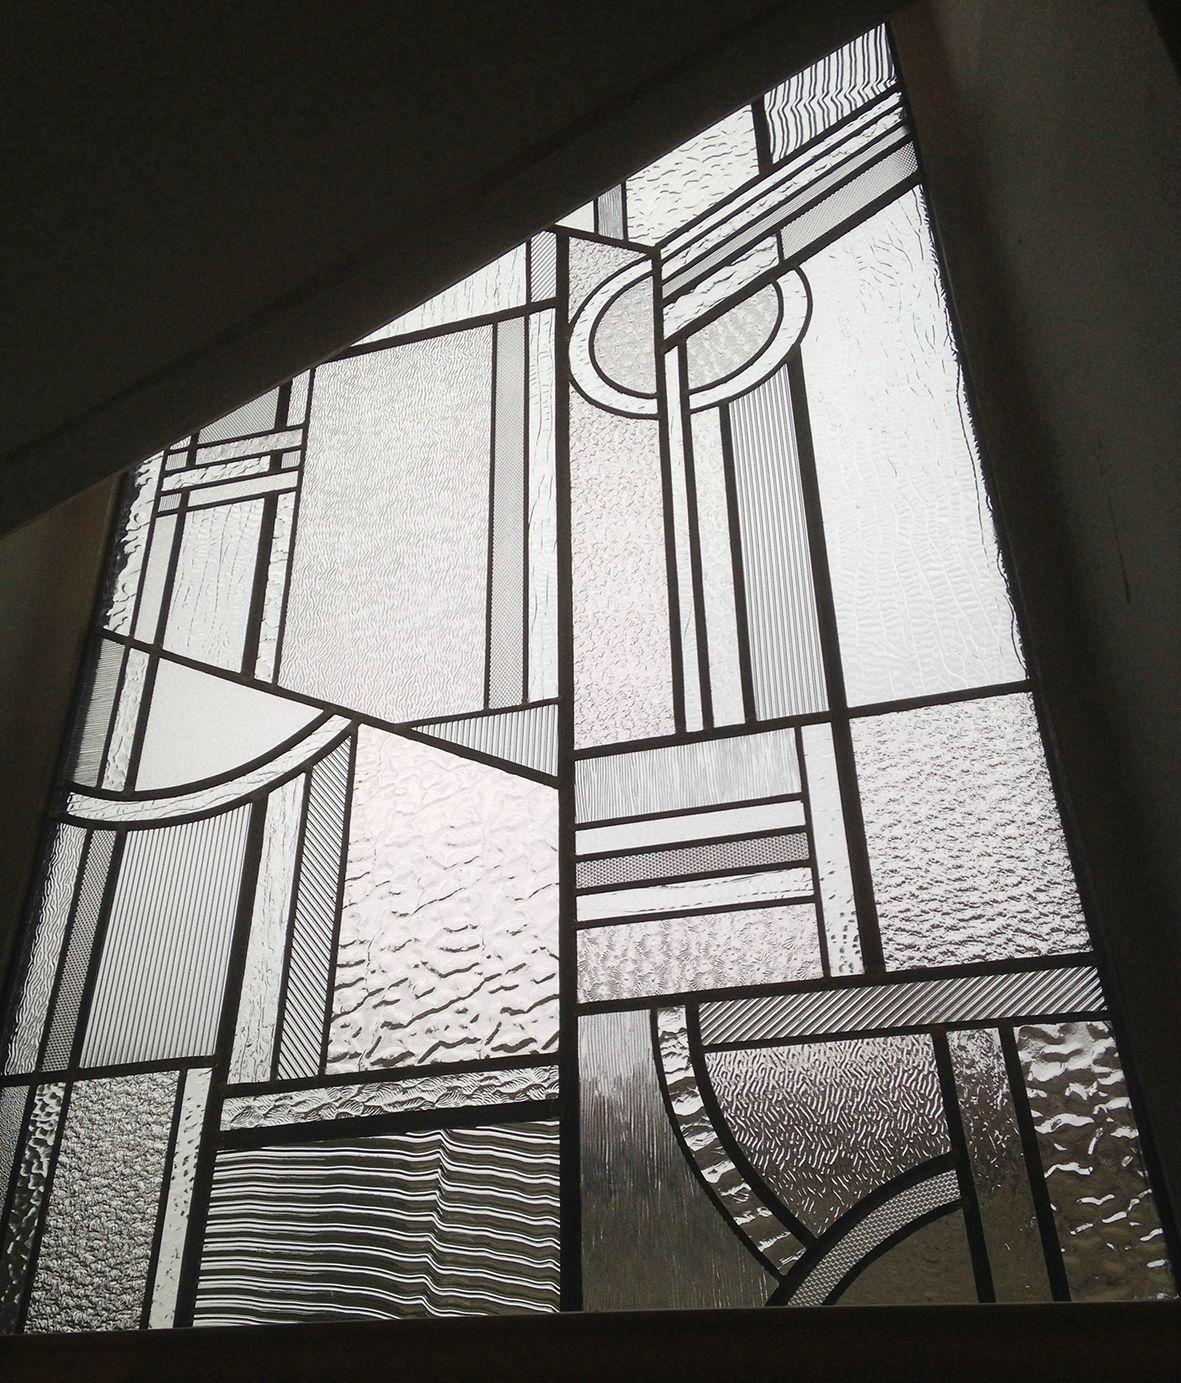 nogent marne divers vitrail art d co et vitrail contemporain. Black Bedroom Furniture Sets. Home Design Ideas